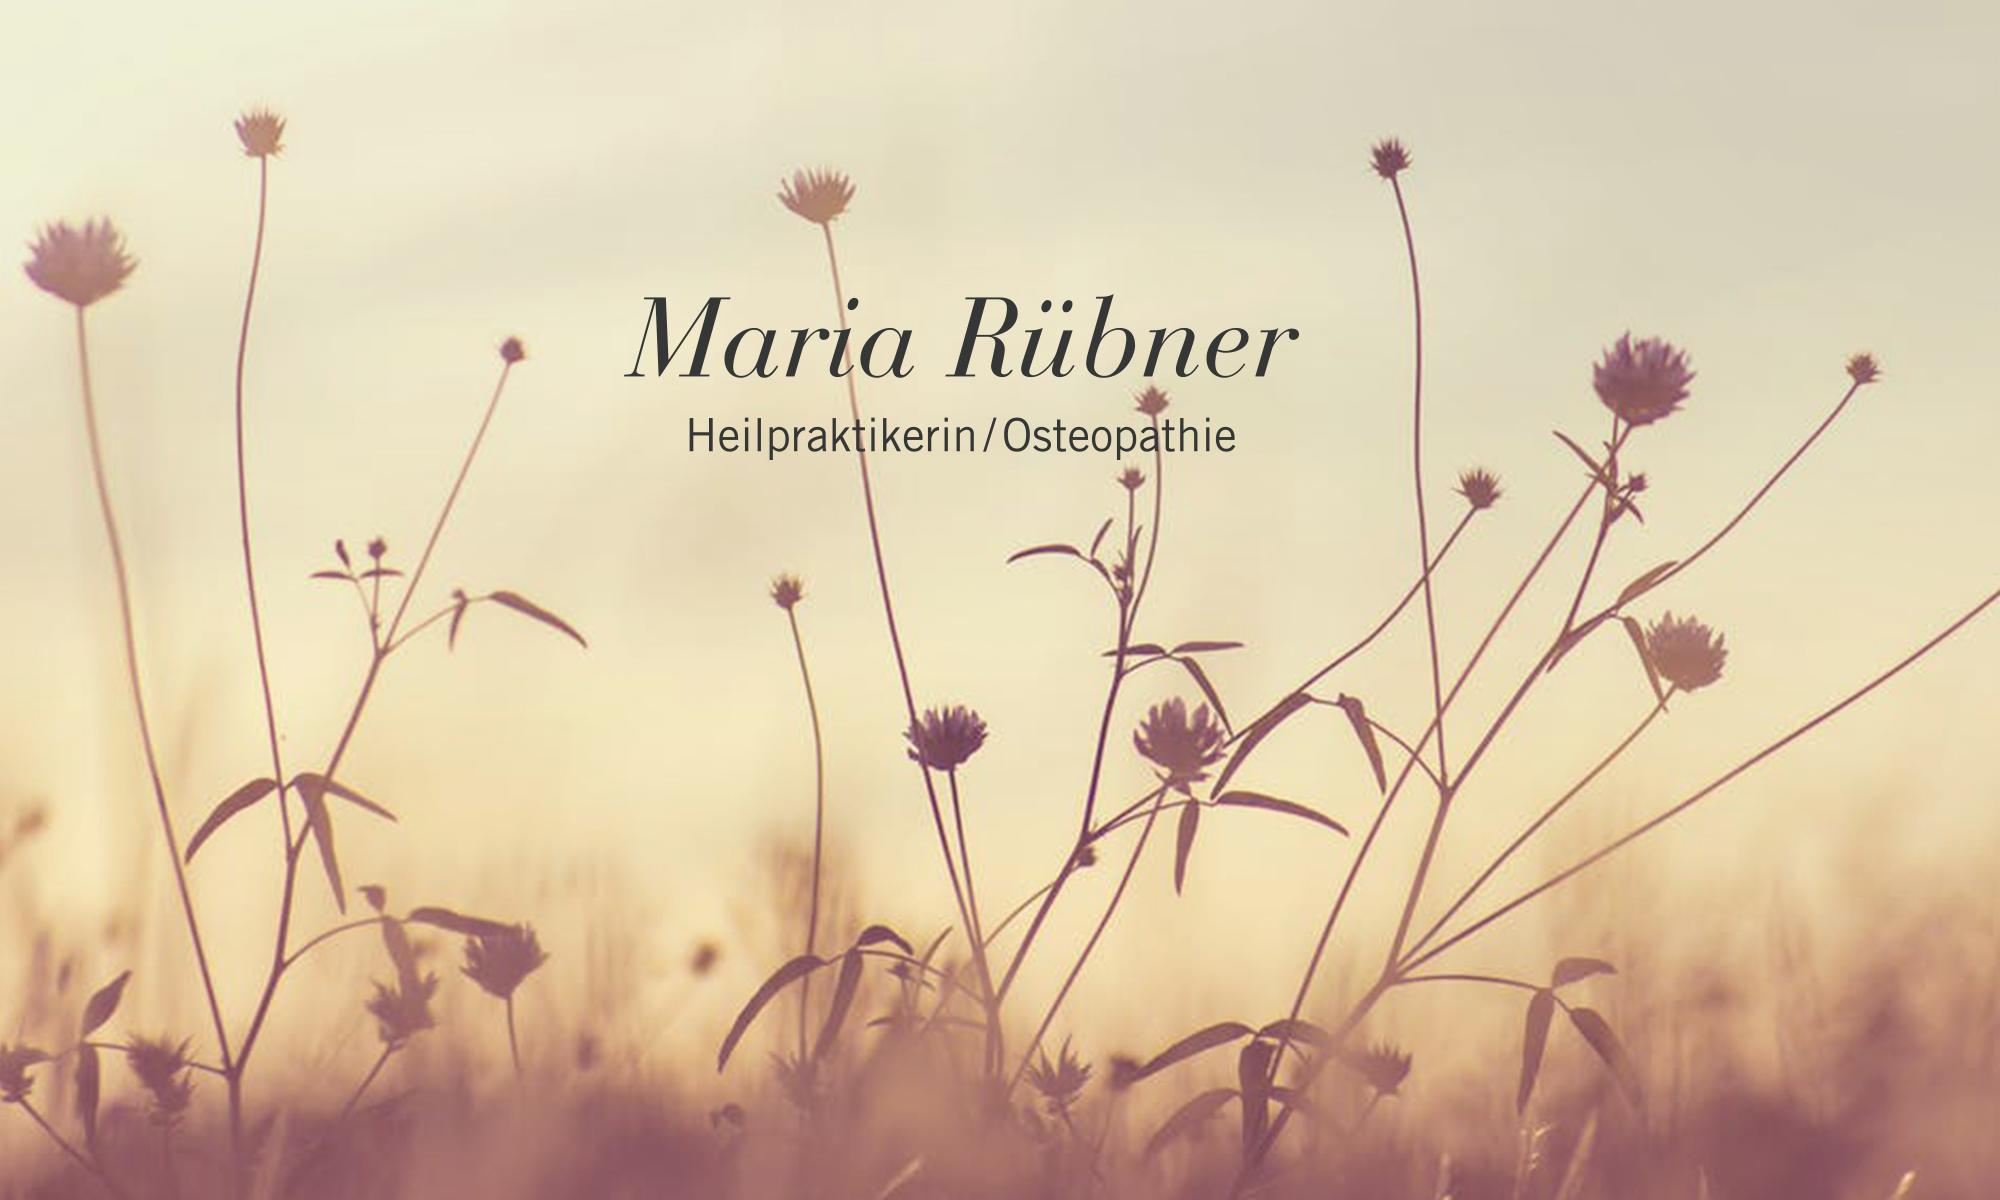 Maria Rübner